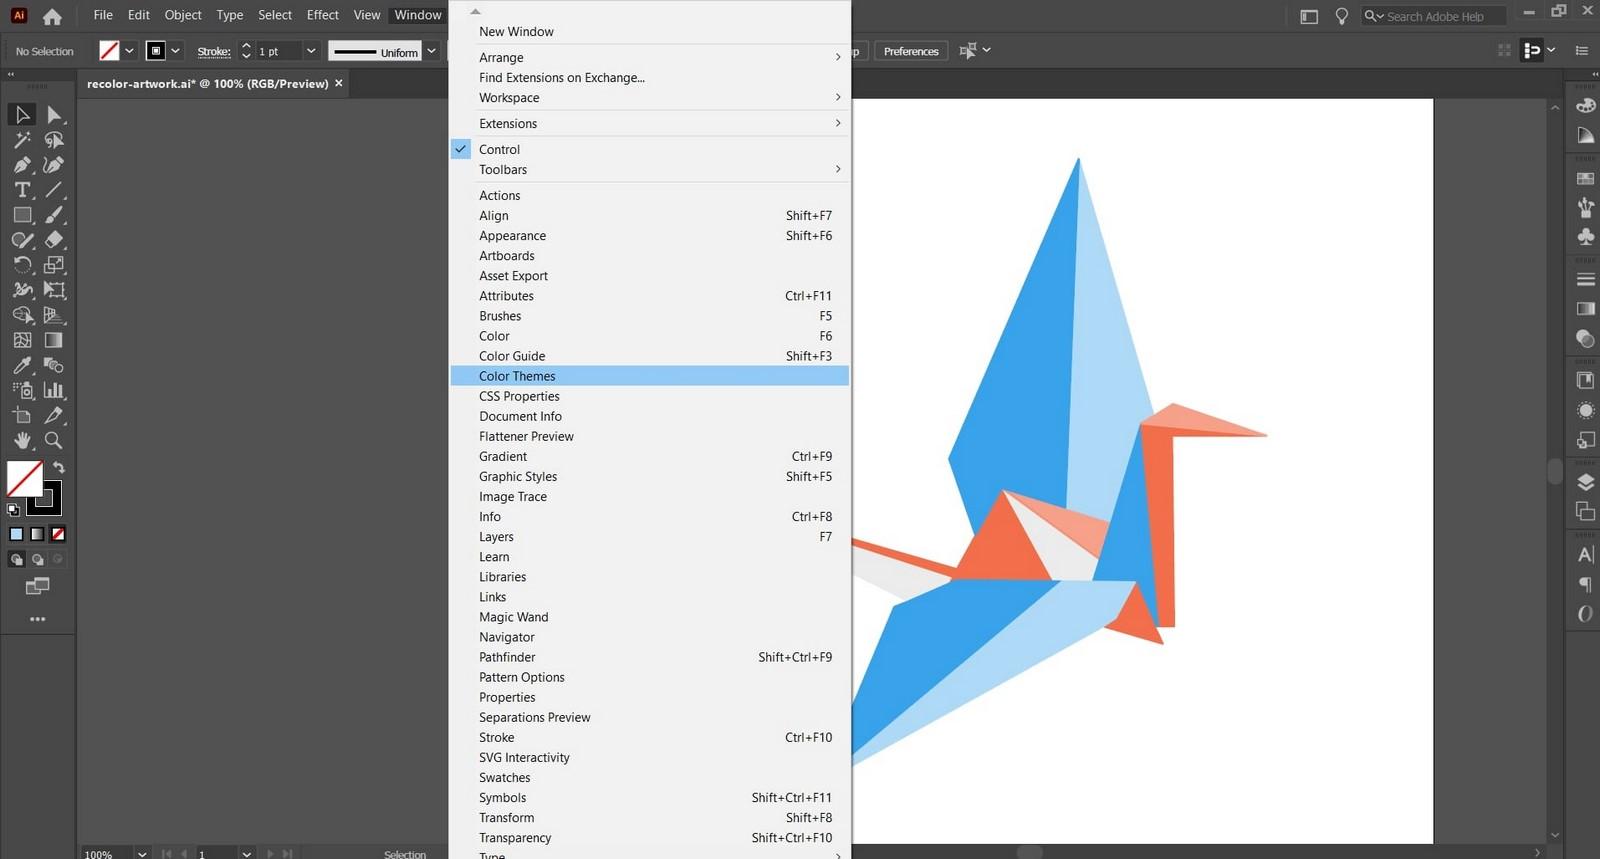 Adobe Color Themes - Sheet1